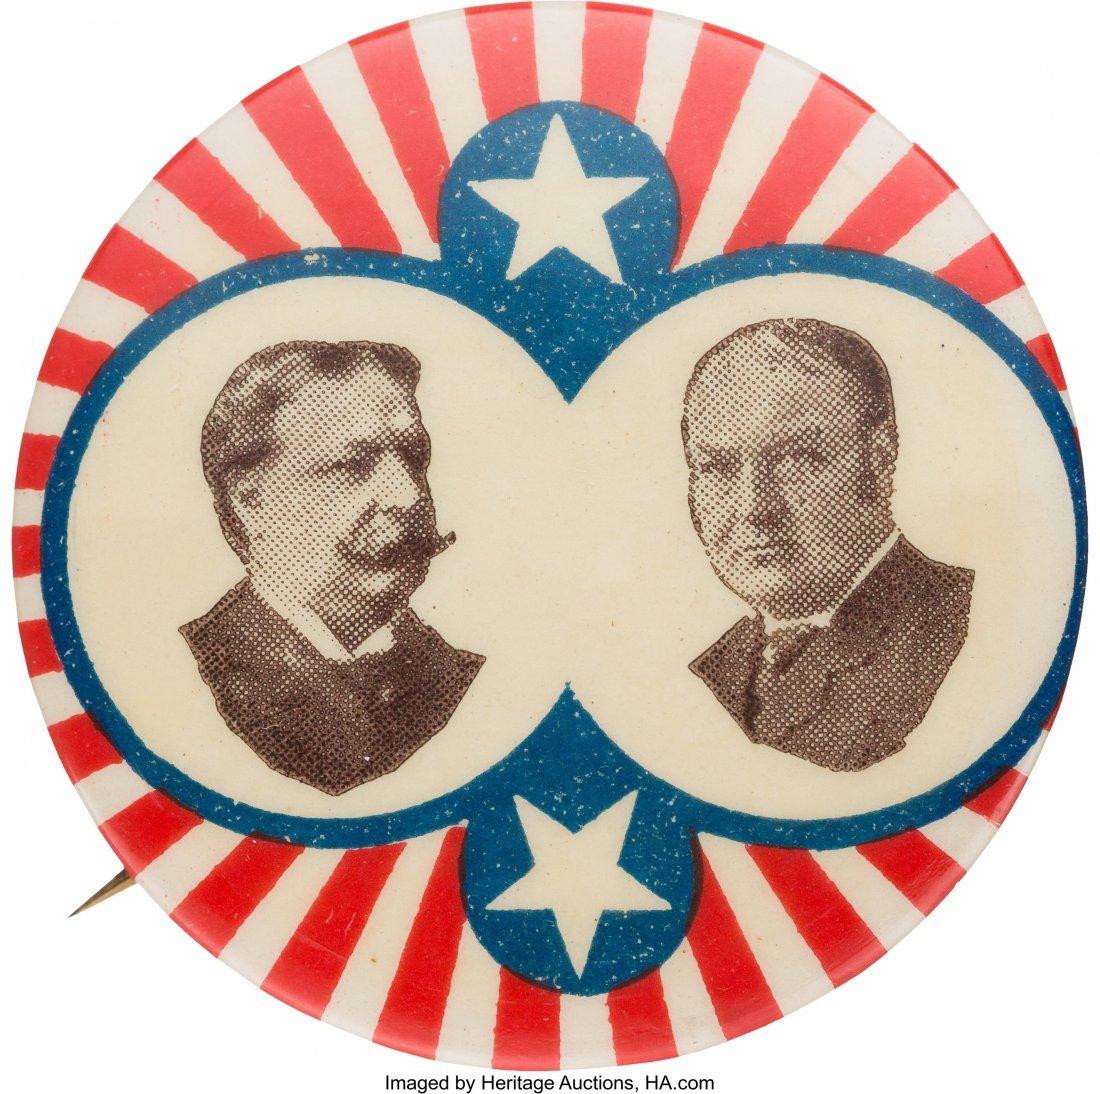 43485: Taft & Sherman: Minty Stars & Stripes Jugate by